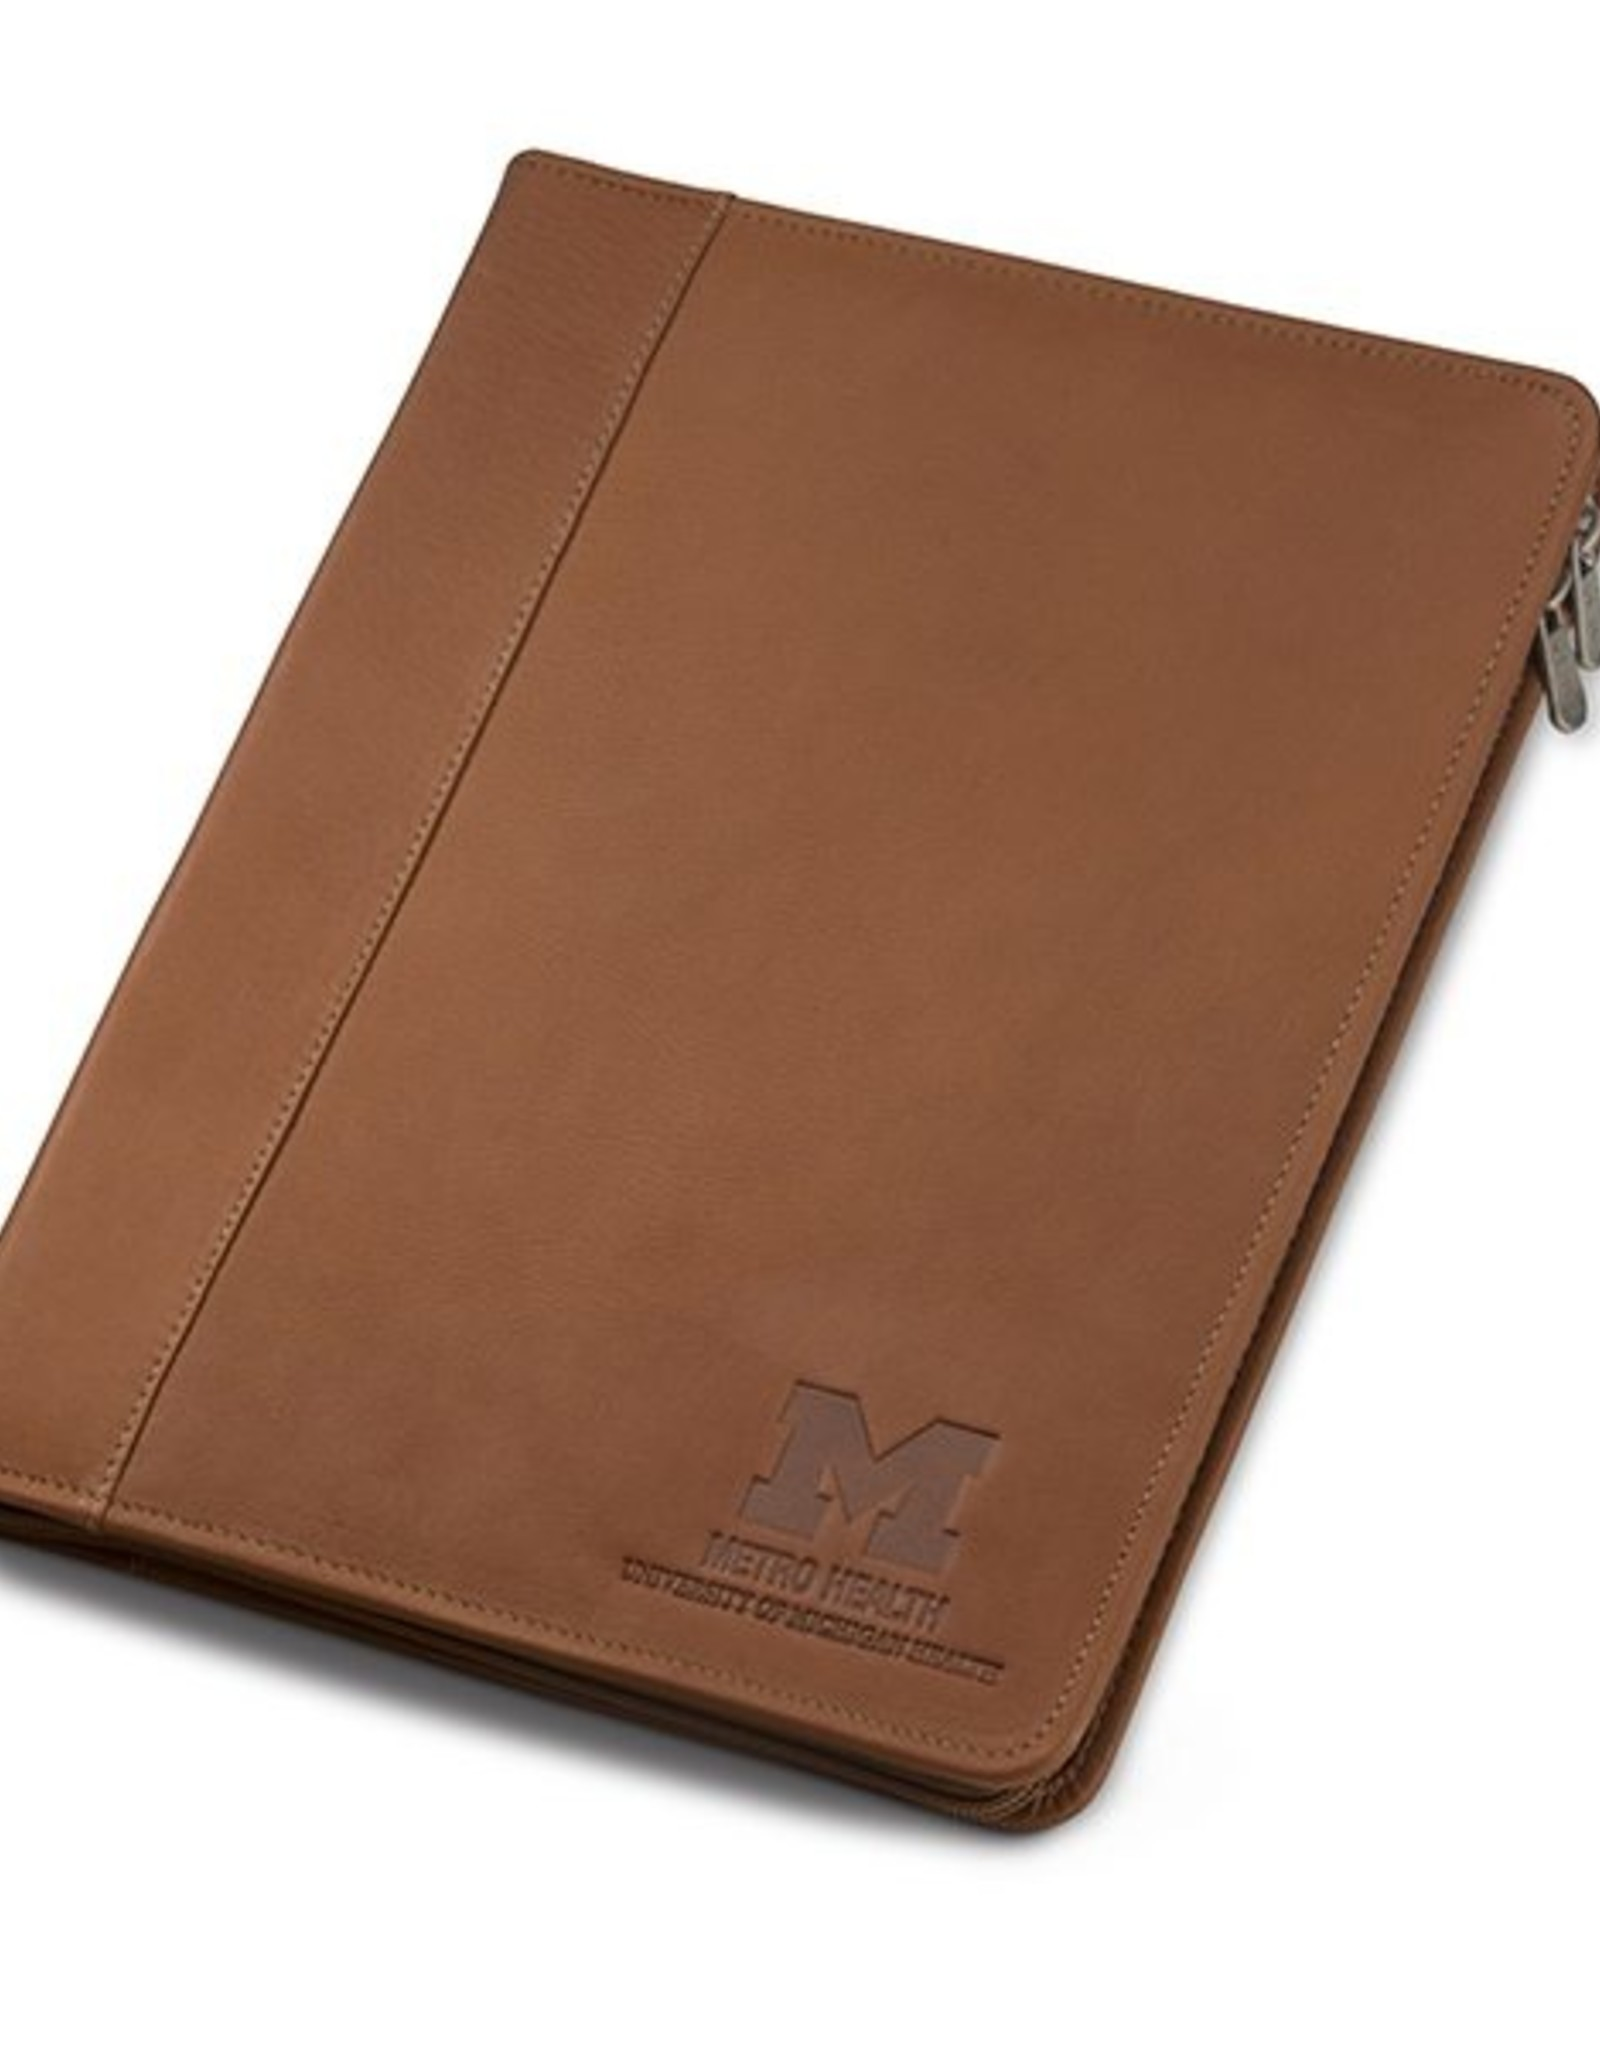 Leather Padfolio *FINAL SALE*